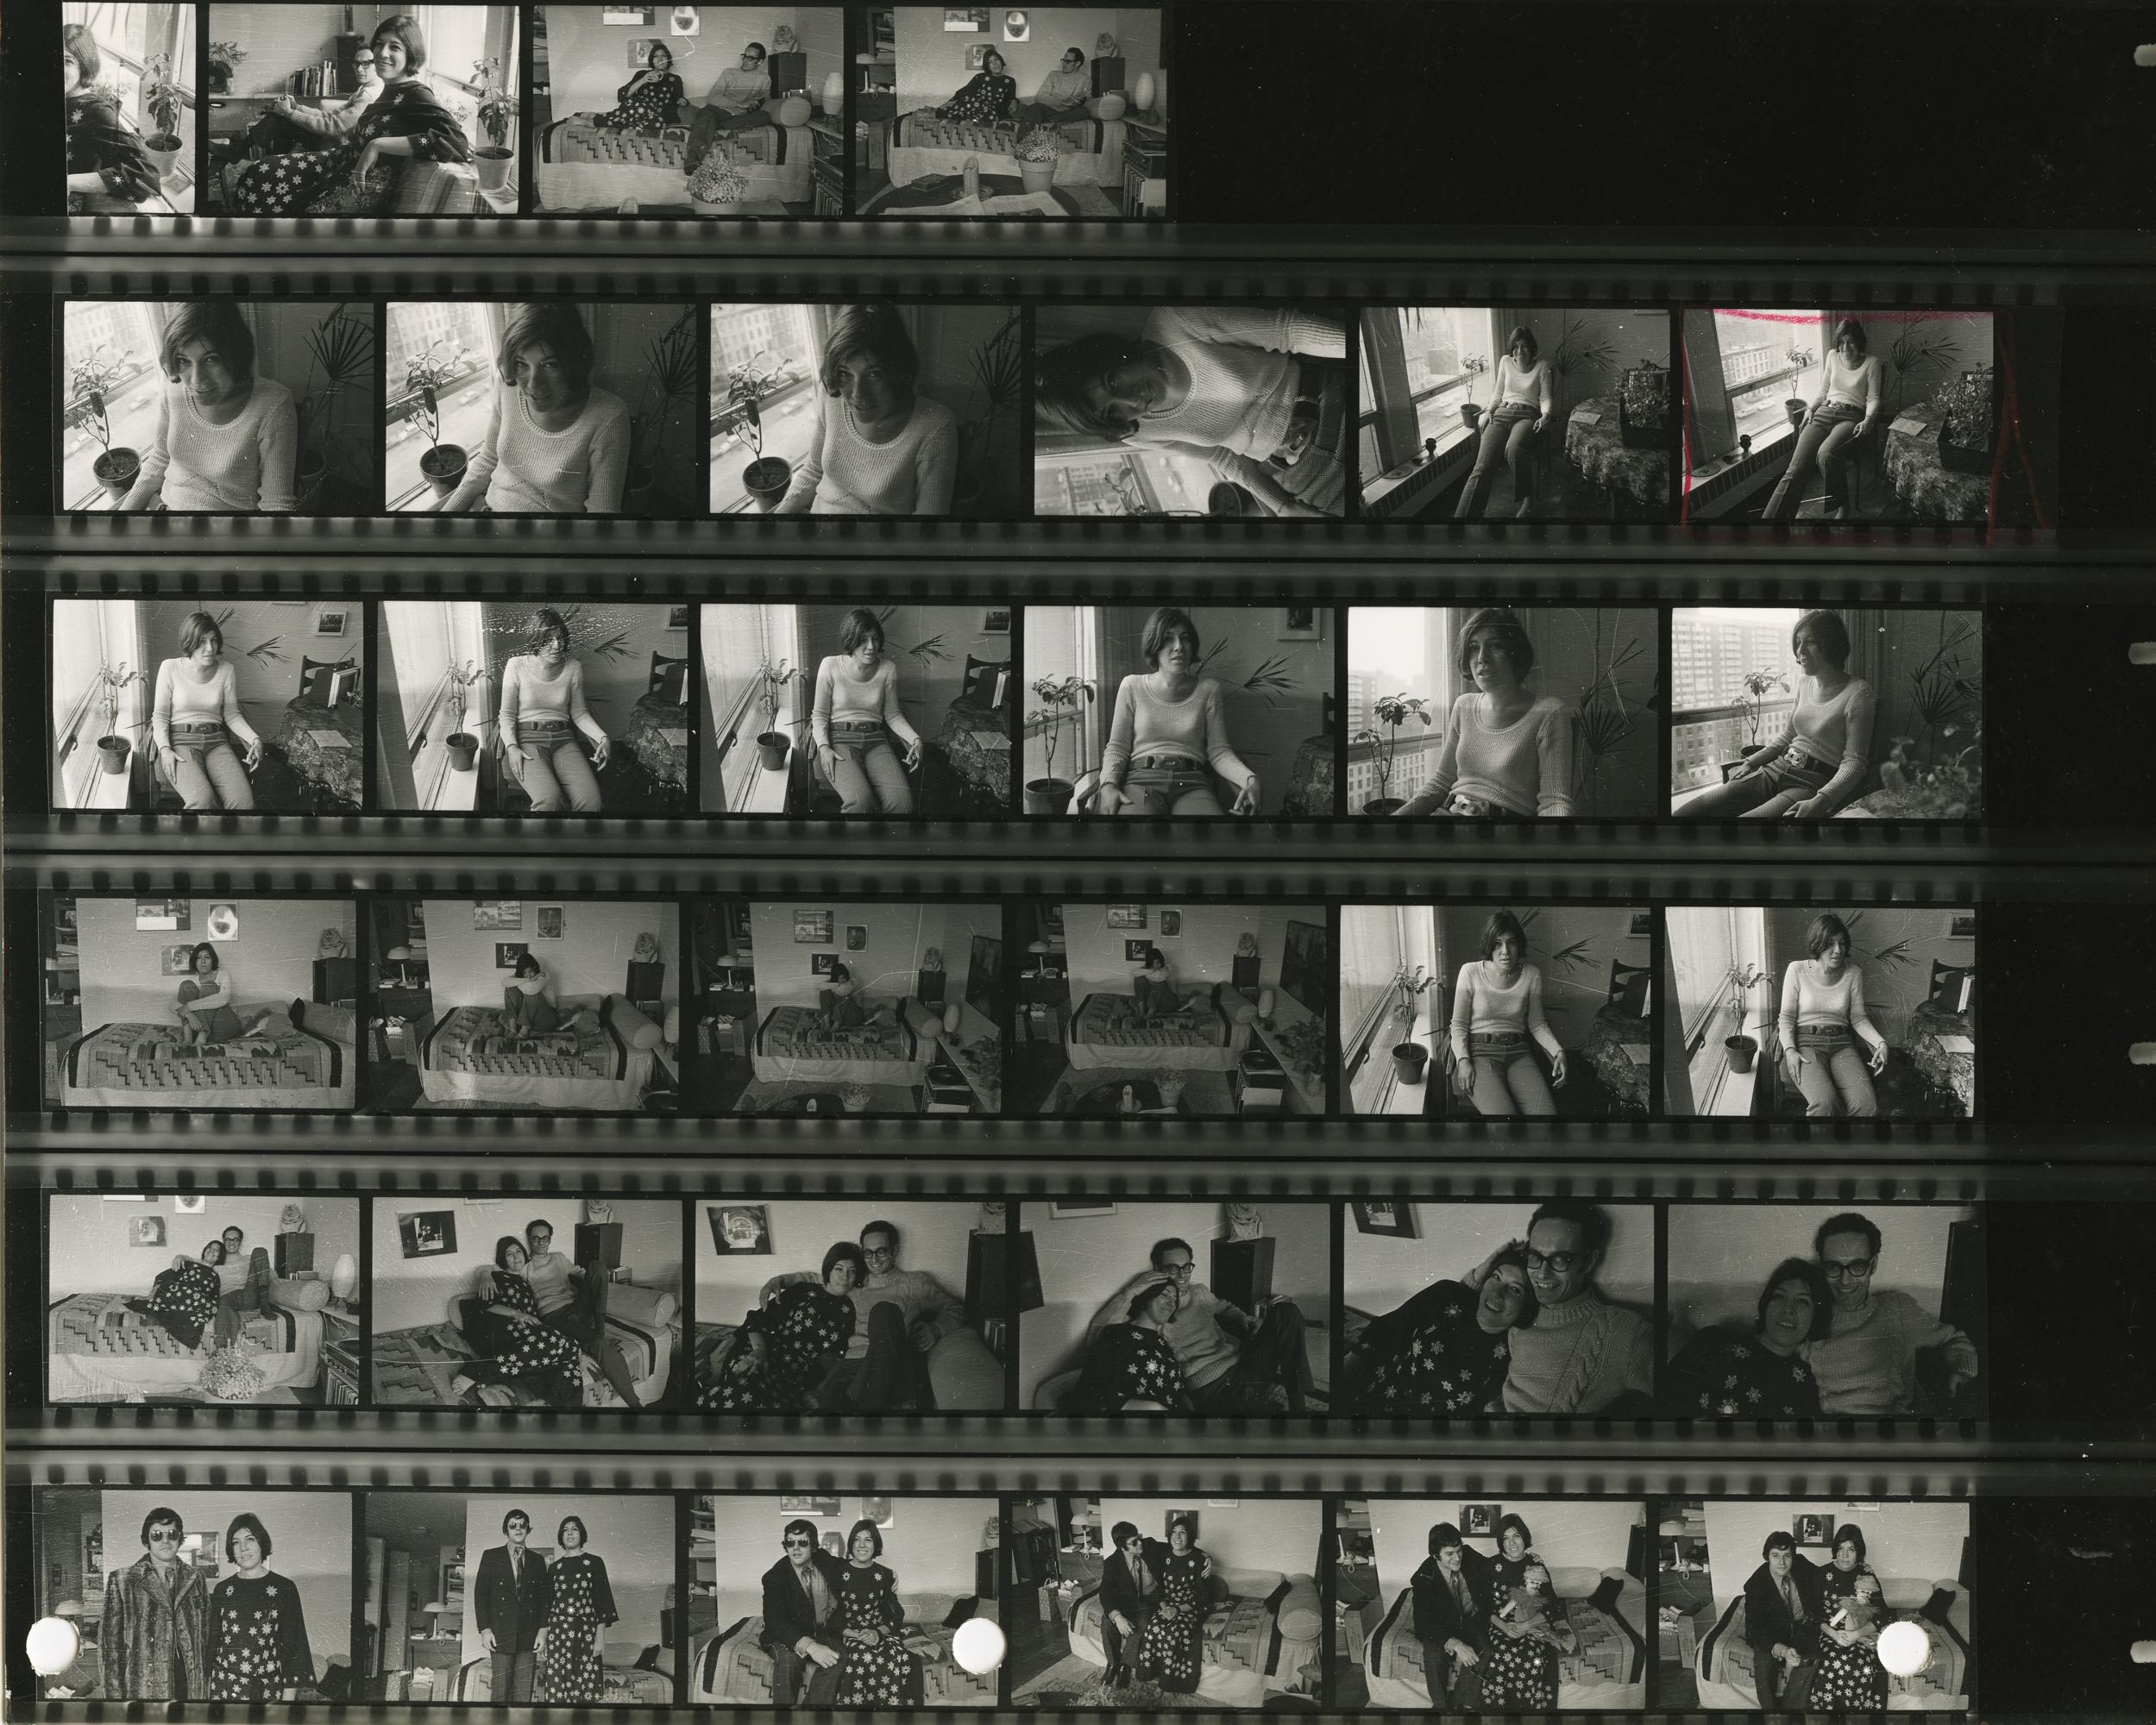 Rachel-Seed, My-Photographic-Memory, Sheila-Turner-Seed, Henri-Cartier-Bresson, photography, Bruce-Davidson, Cornell-Capa, Lisette-Model, W.-Eugene-Smith, William-Albert-Allard, Don-McCullin, International-Center-of-Photography, interviews, short-films, photographers